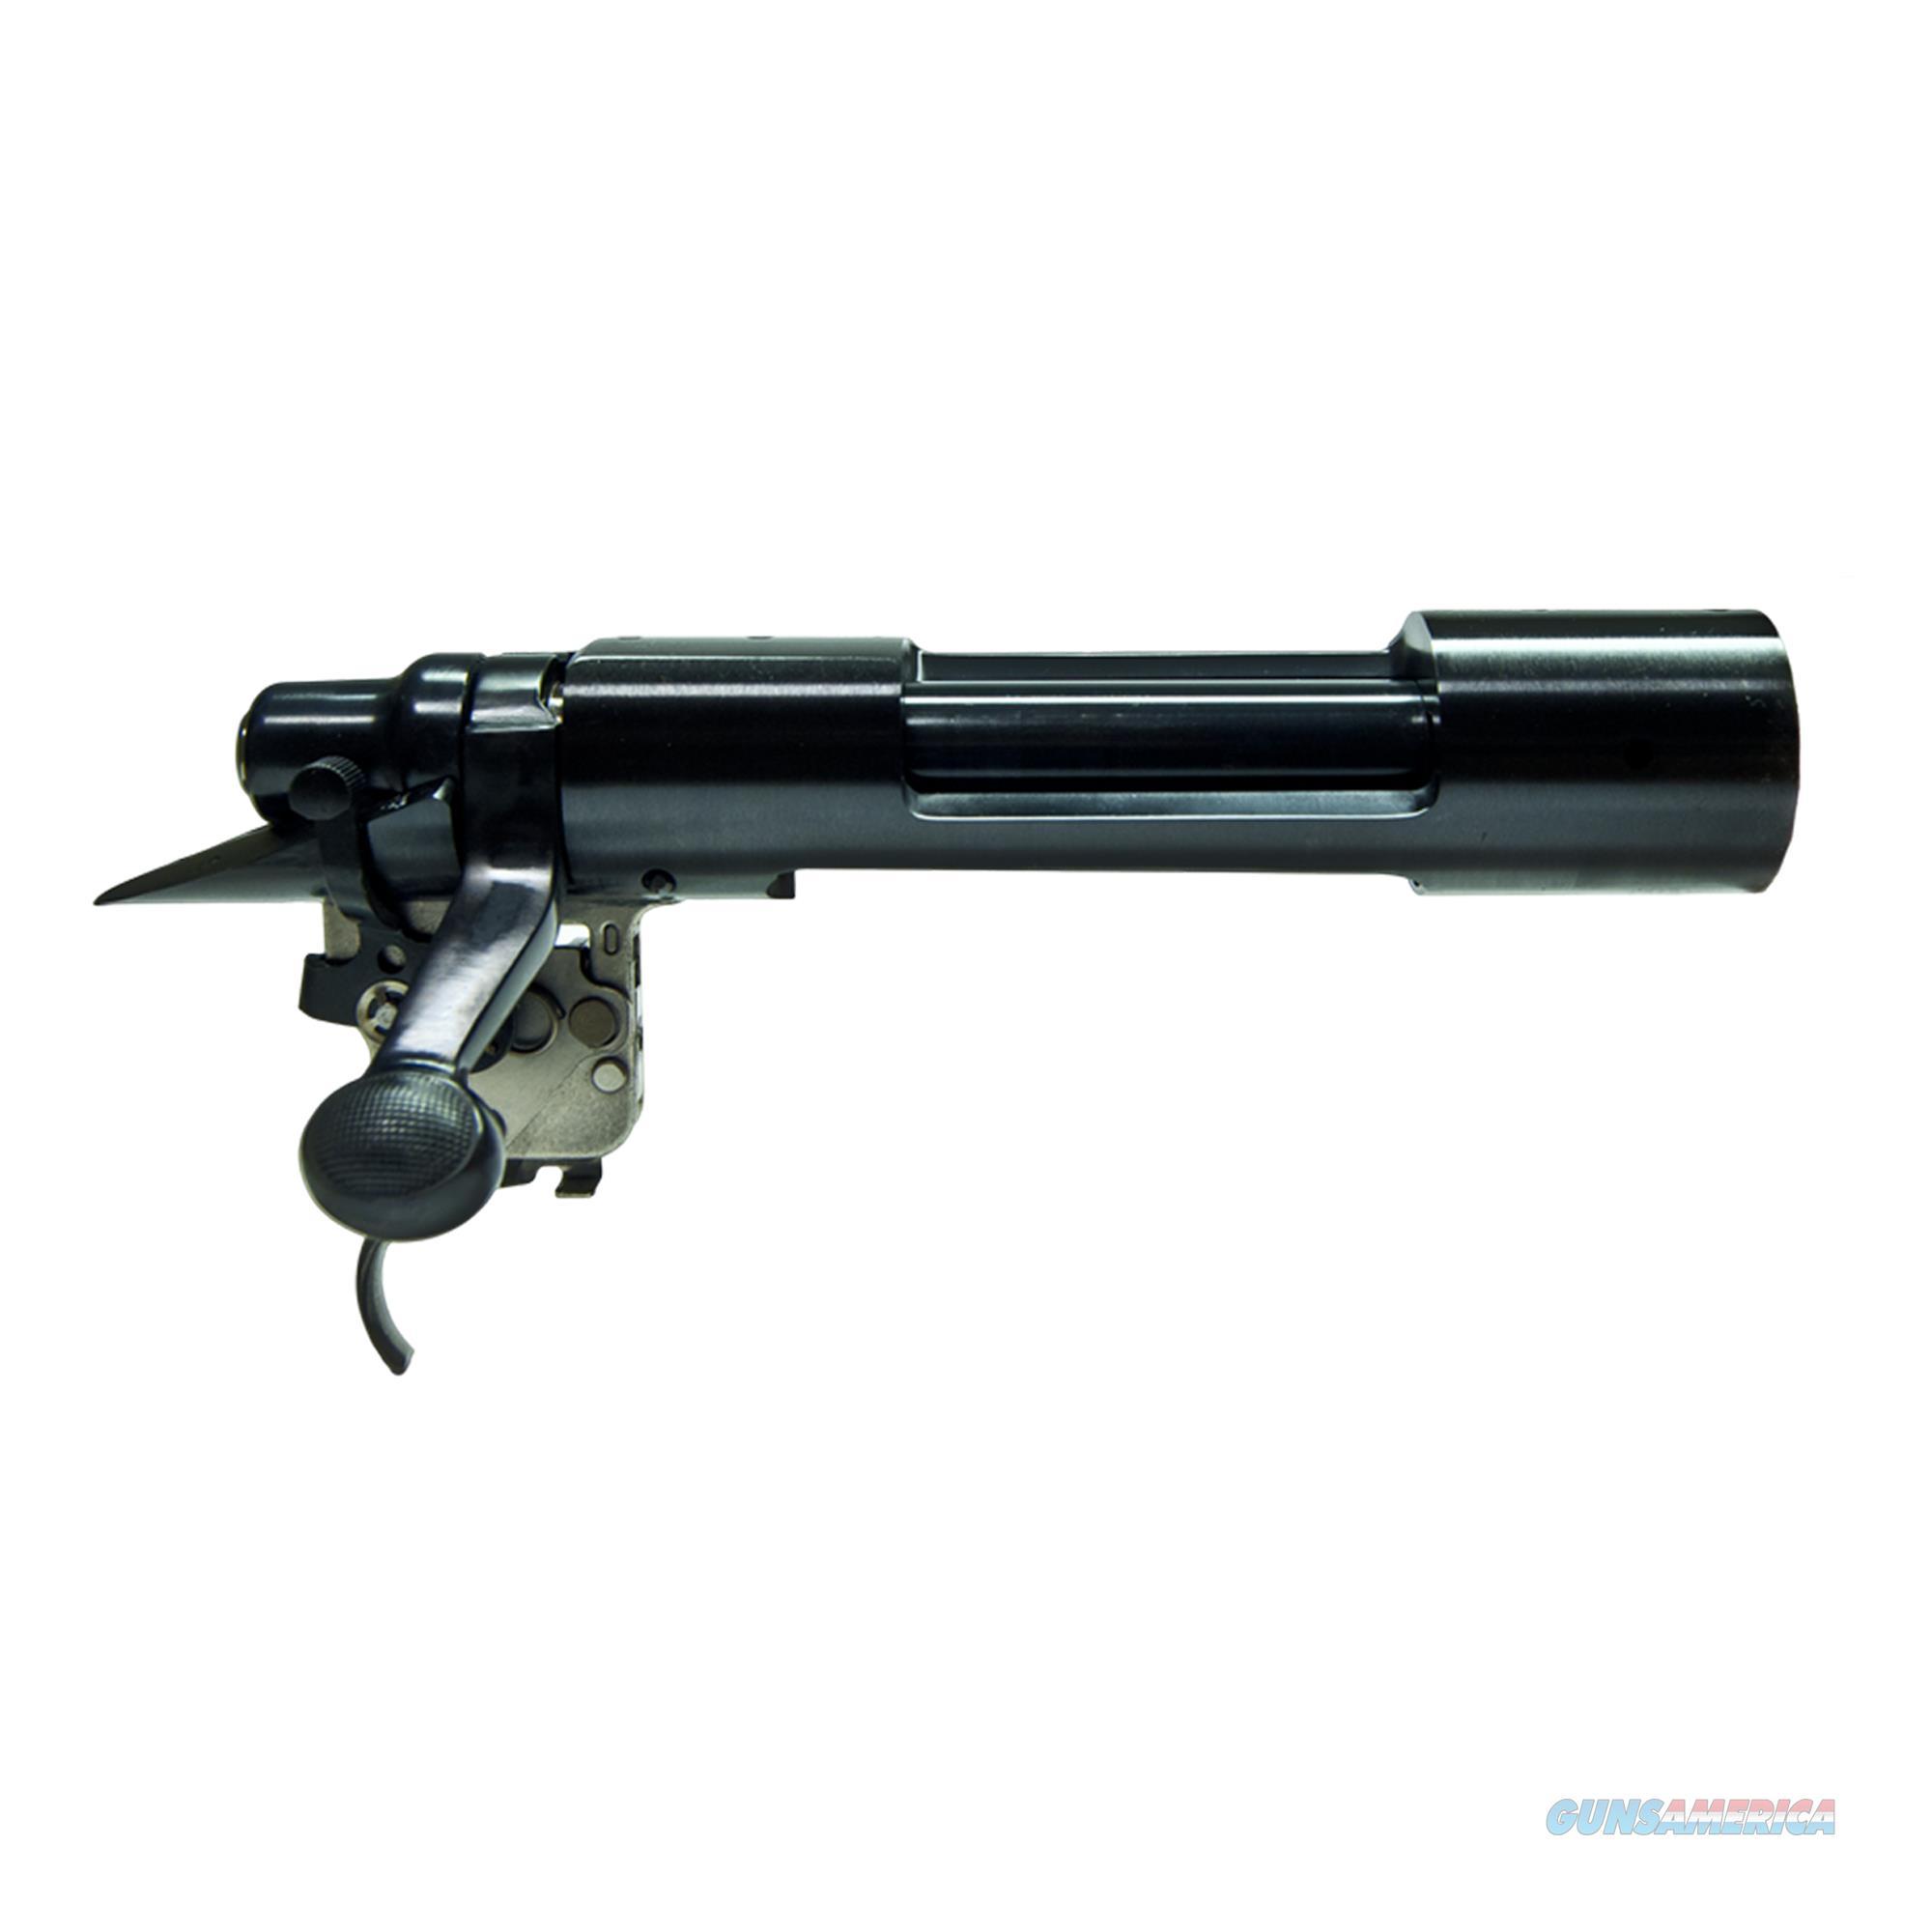 Remington 700 Long Action Receiver w/X-Mark Pro Trigger - New in Box  Guns > Rifles > Remington Rifles - Modern > Model 700 > Sporting